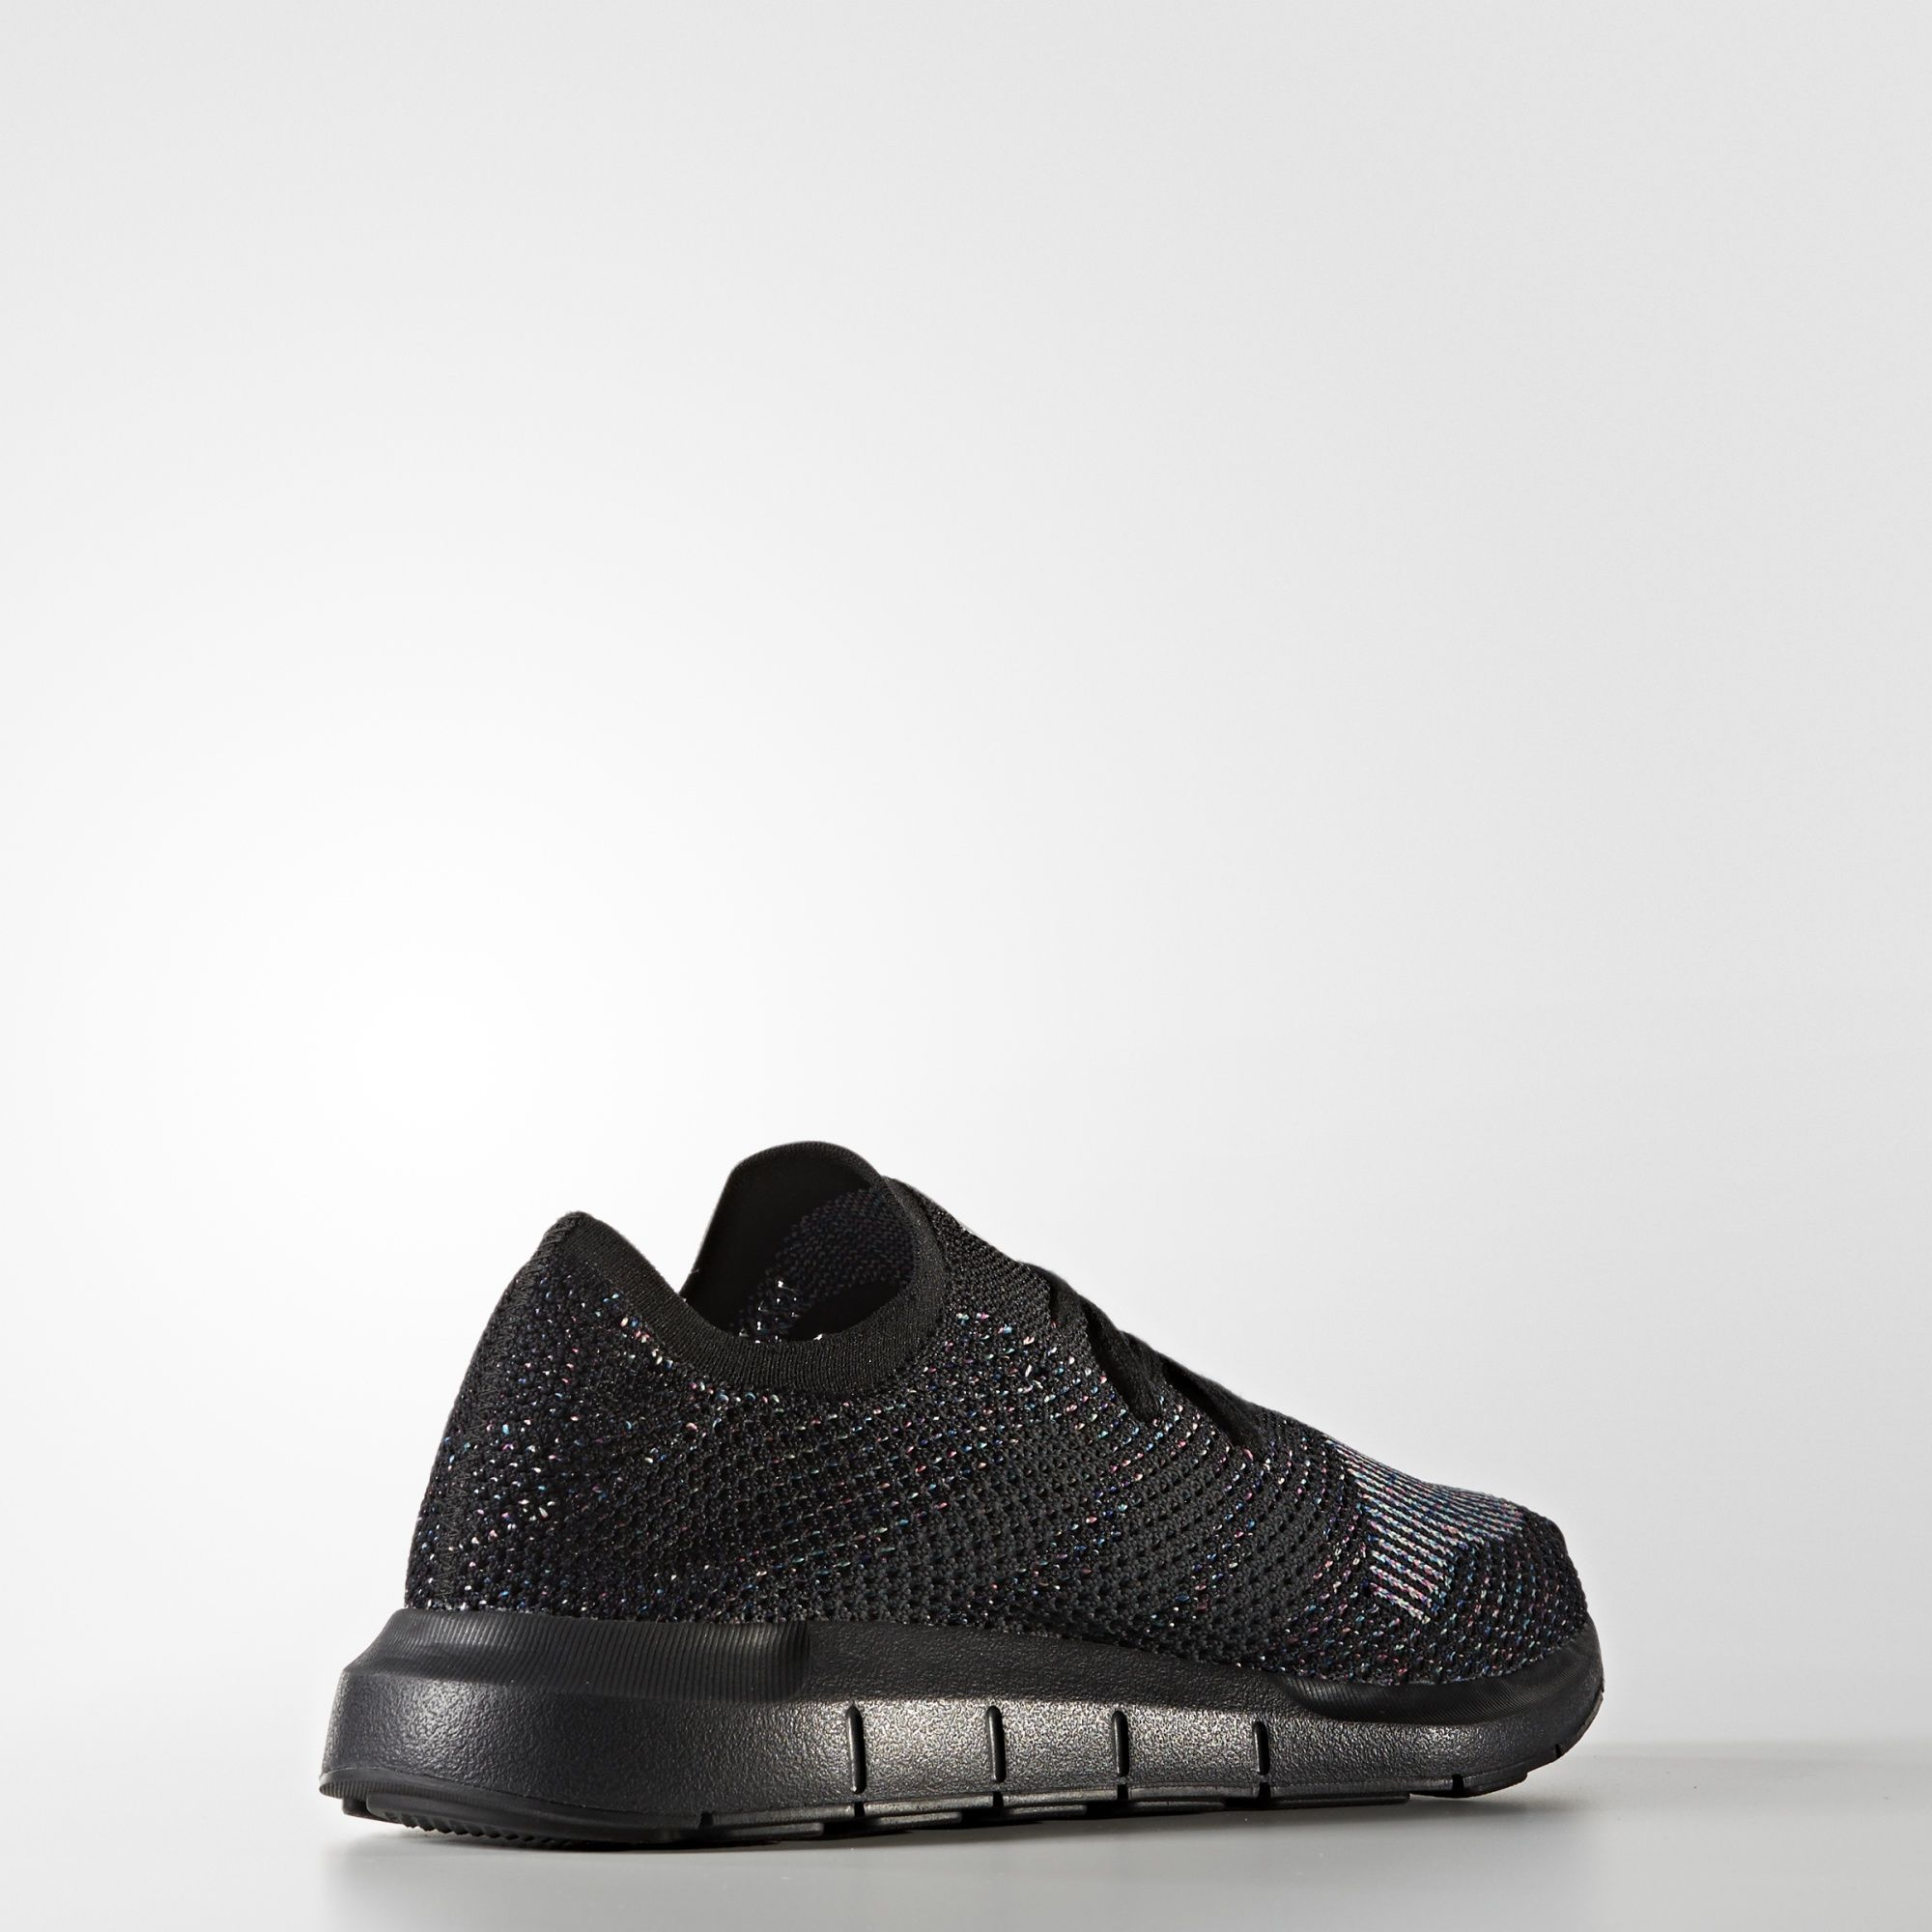 CG4127 adidas Swift Run Primeknit Black 3